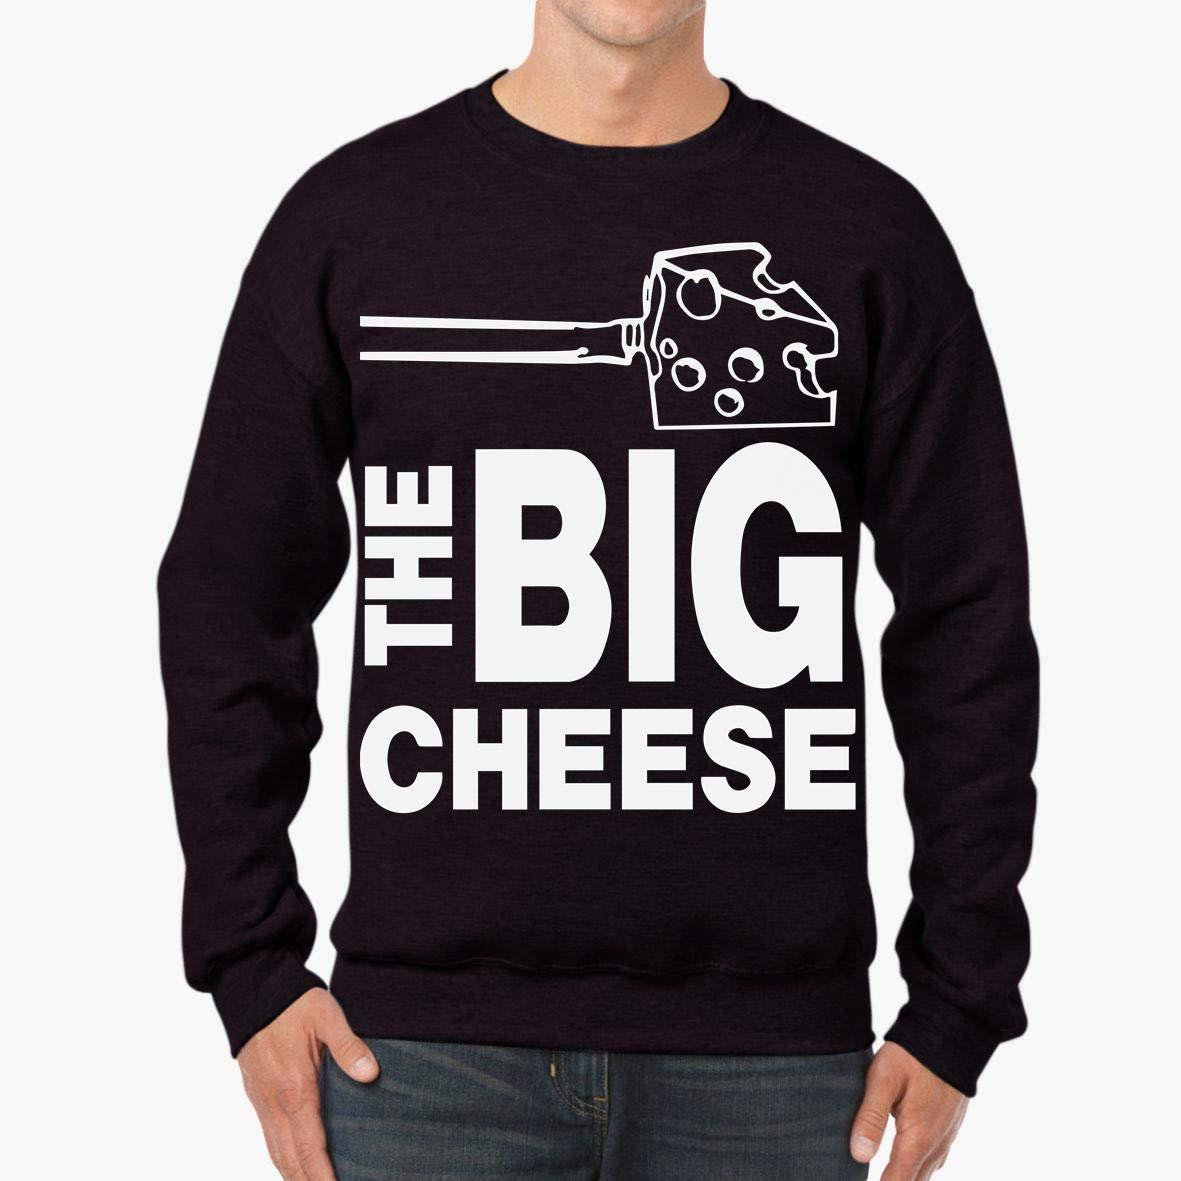 The Big Cheese Funny Birthday Vegan Gift Unisex Sweatshirt tee